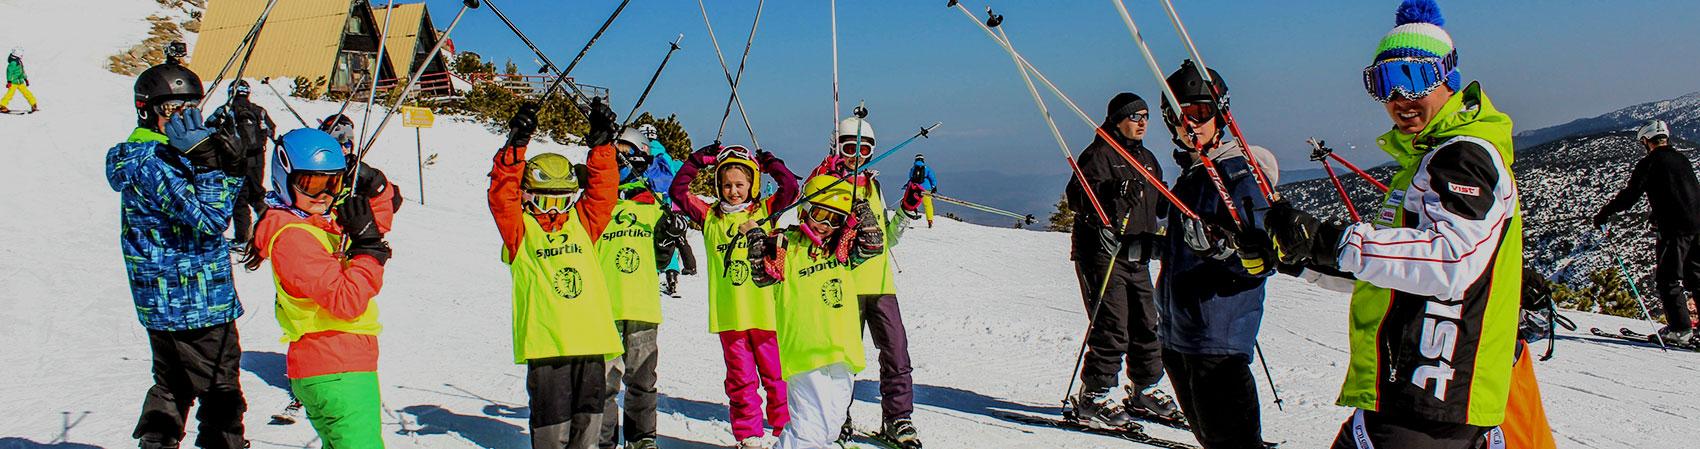 Private ski and snowboard lessons